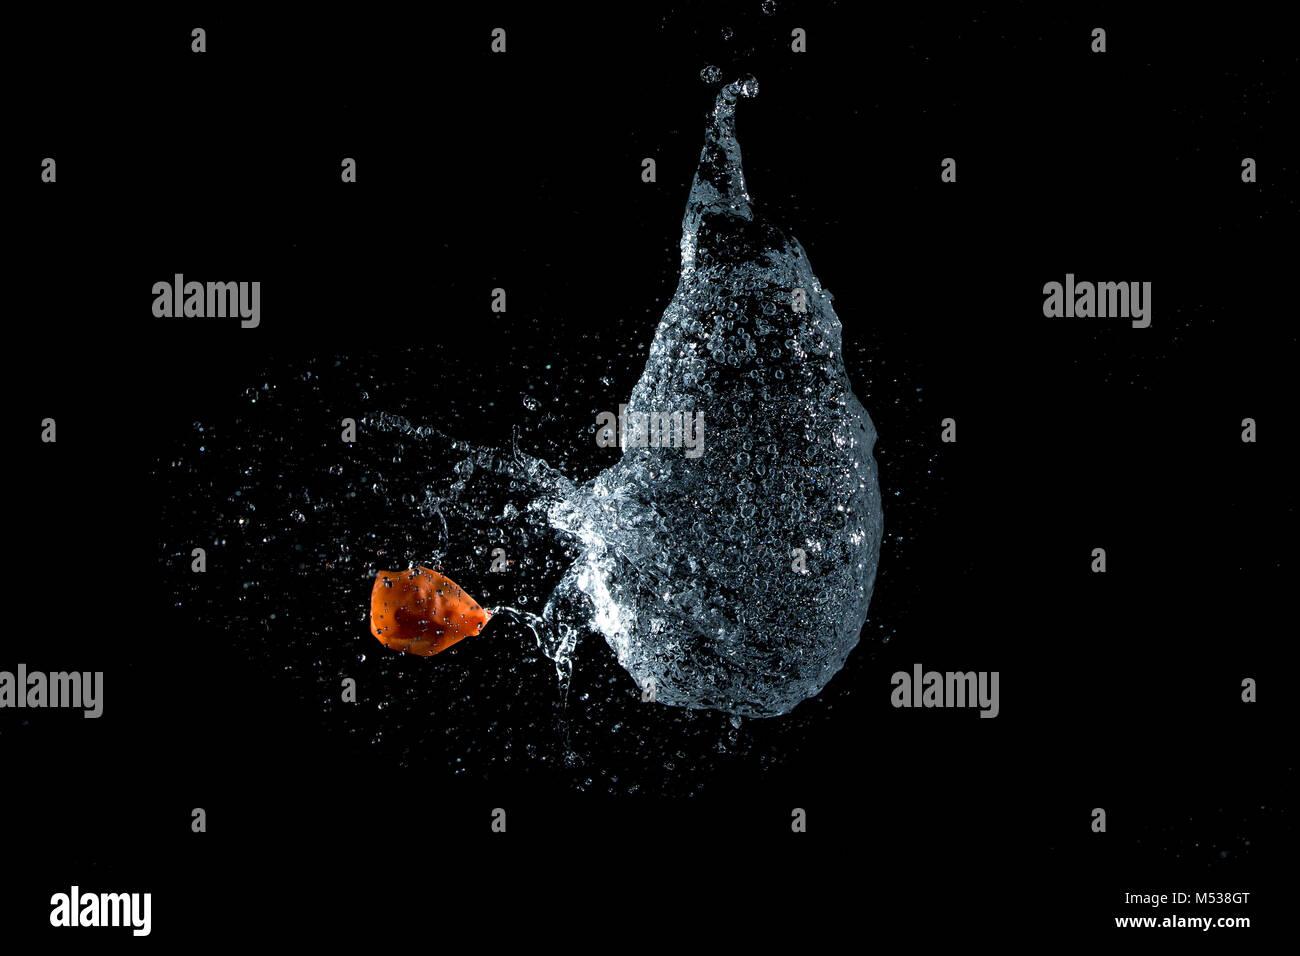 Water Balloon teardrop bursting - Stock Image